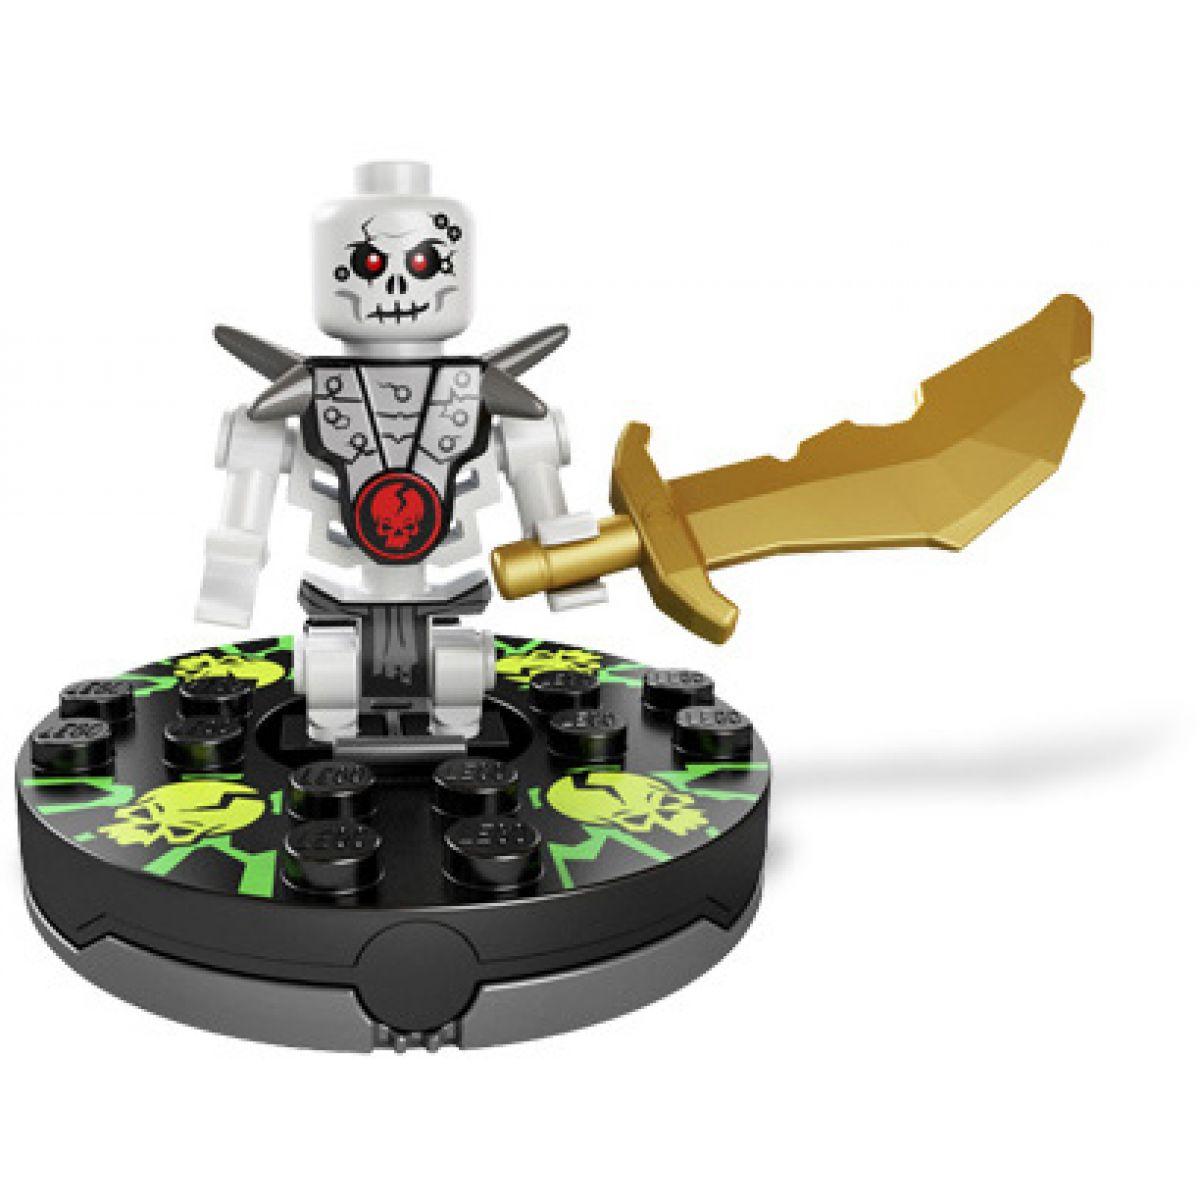 LEGO 2114 Ninjago Chopov